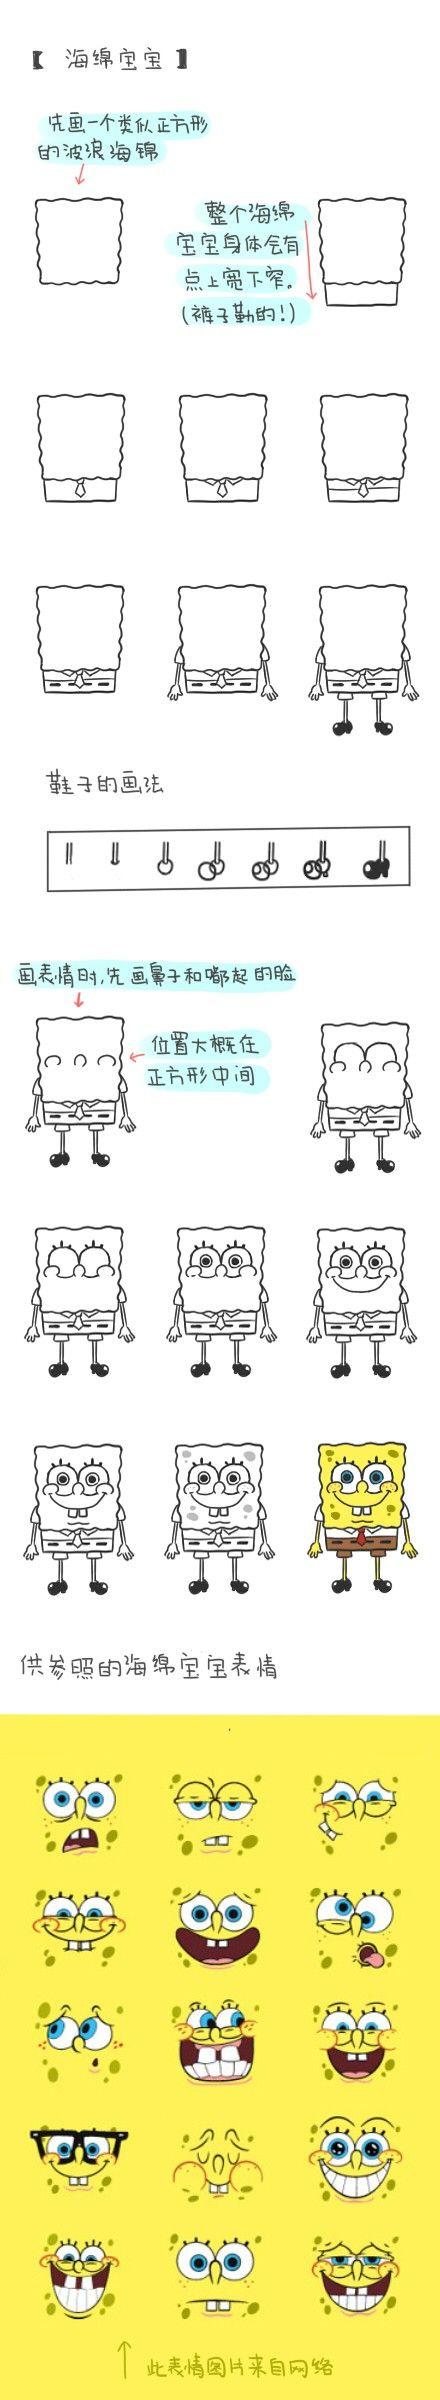 109 best spongebob images on pinterest spongebob squarepants